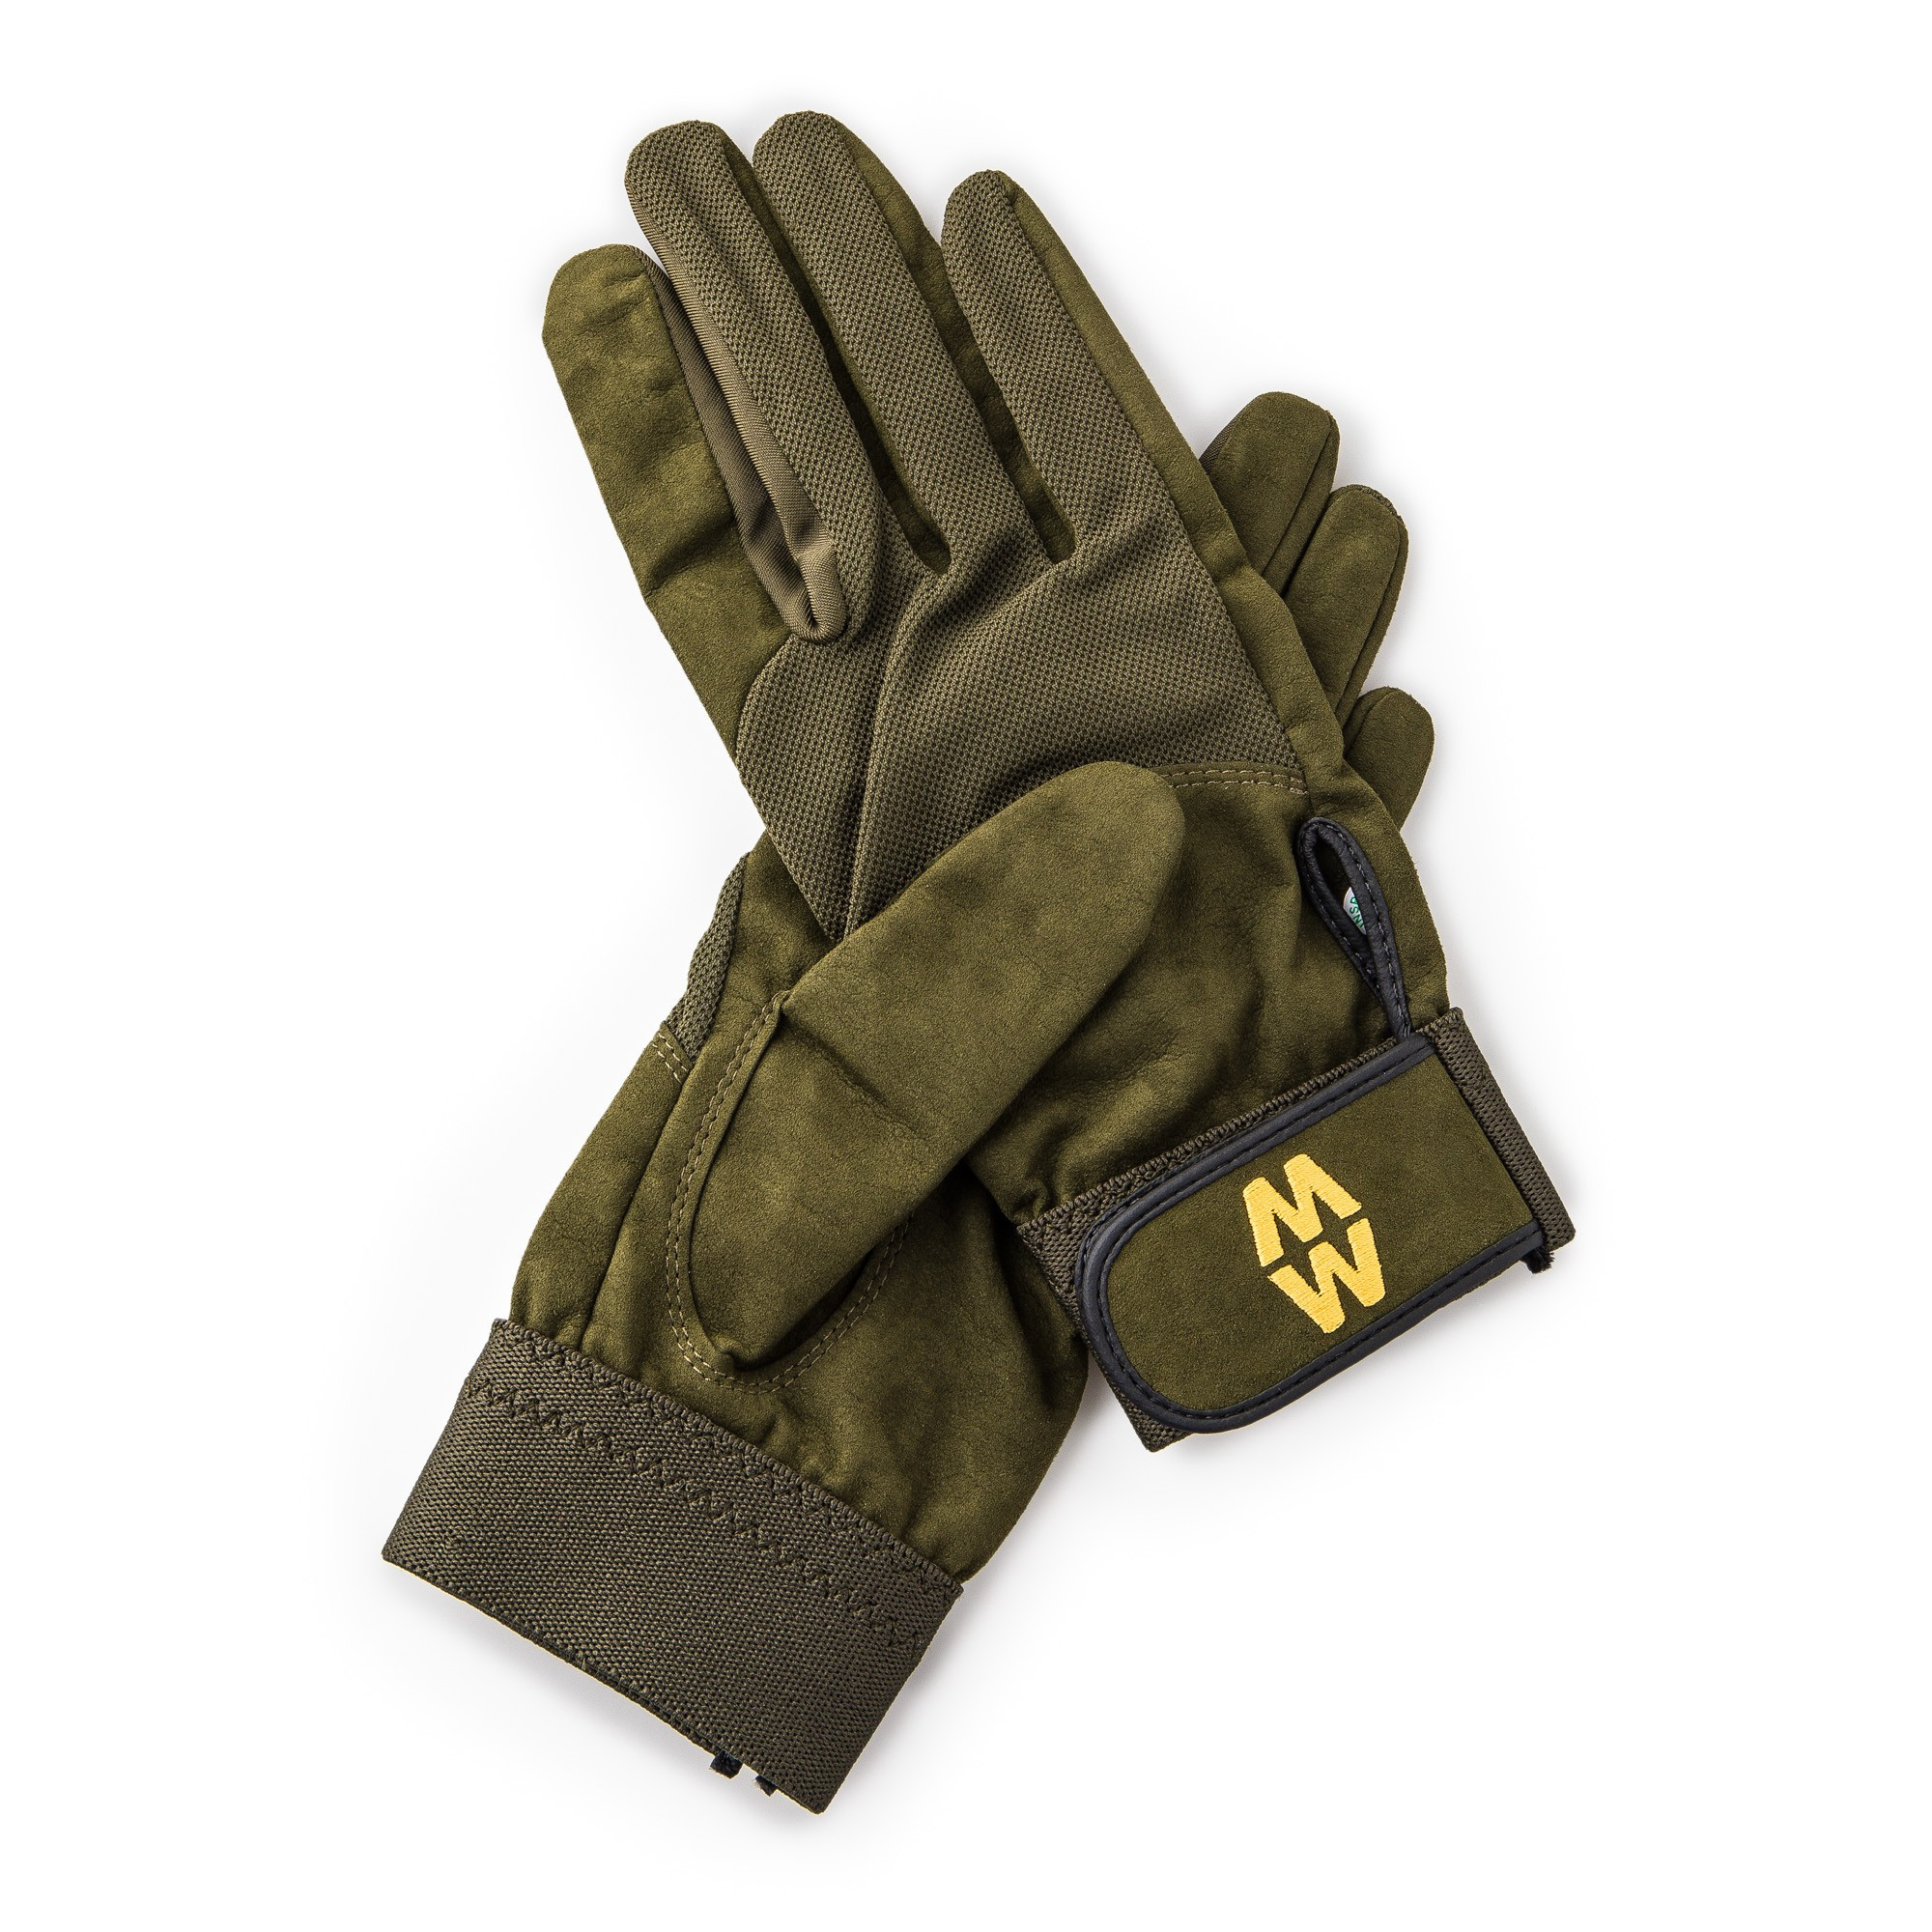 Macwet Mens /& Womens 1 Pair Long Mesh Sports Gloves 9 Green